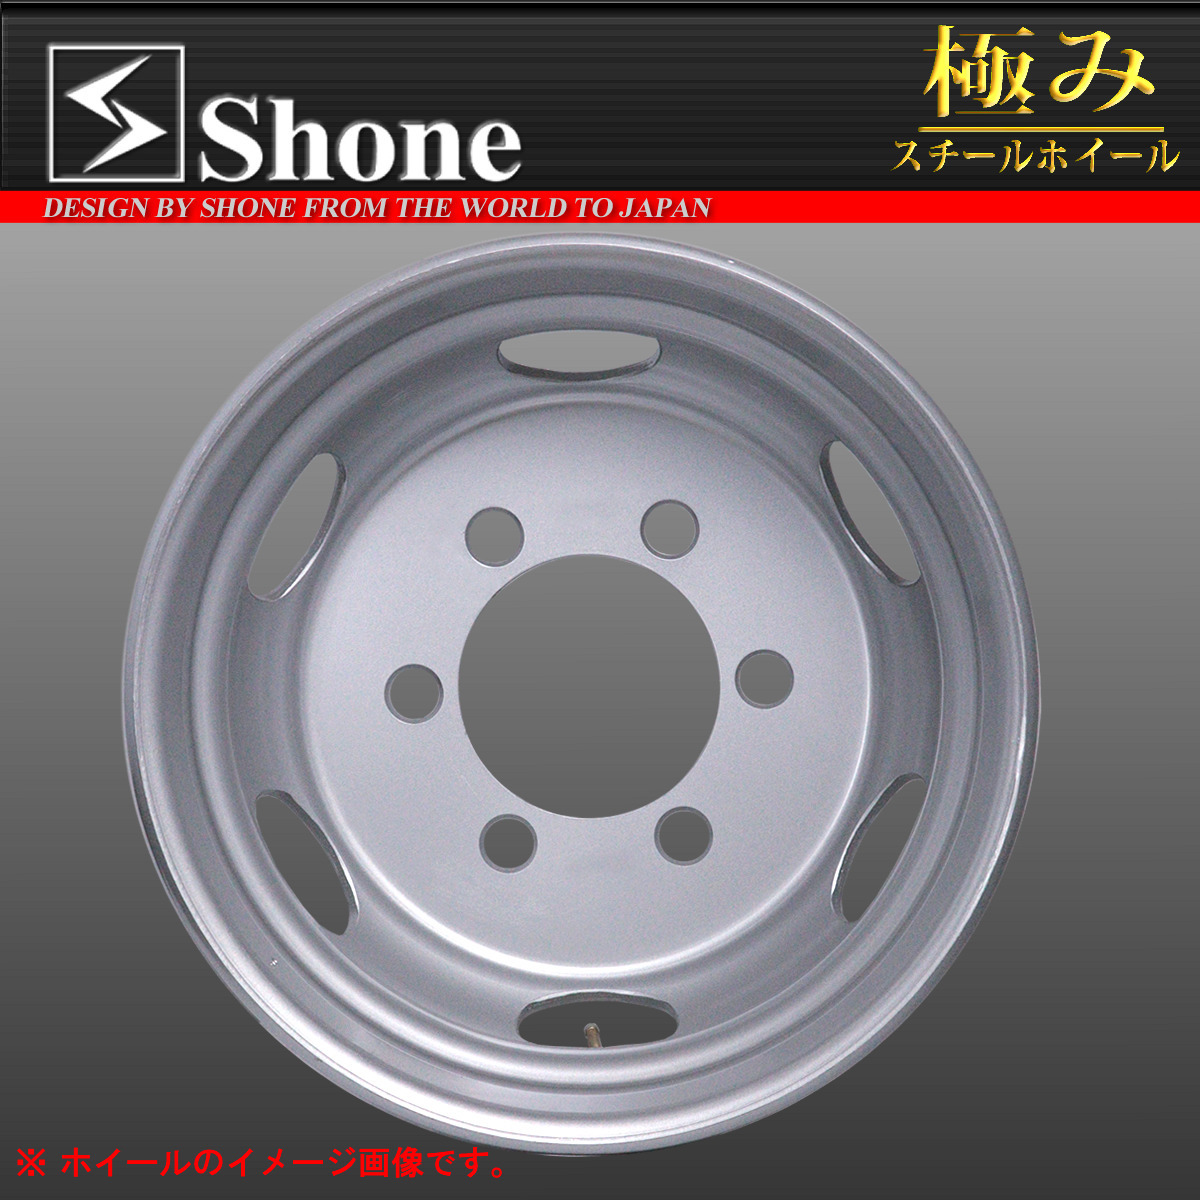 ◆SH141◆増トン車用スチールホイール 19.5×6.75 オフセット+136 6穴 1本価格 JIS規格 SHONE製NEWモデル